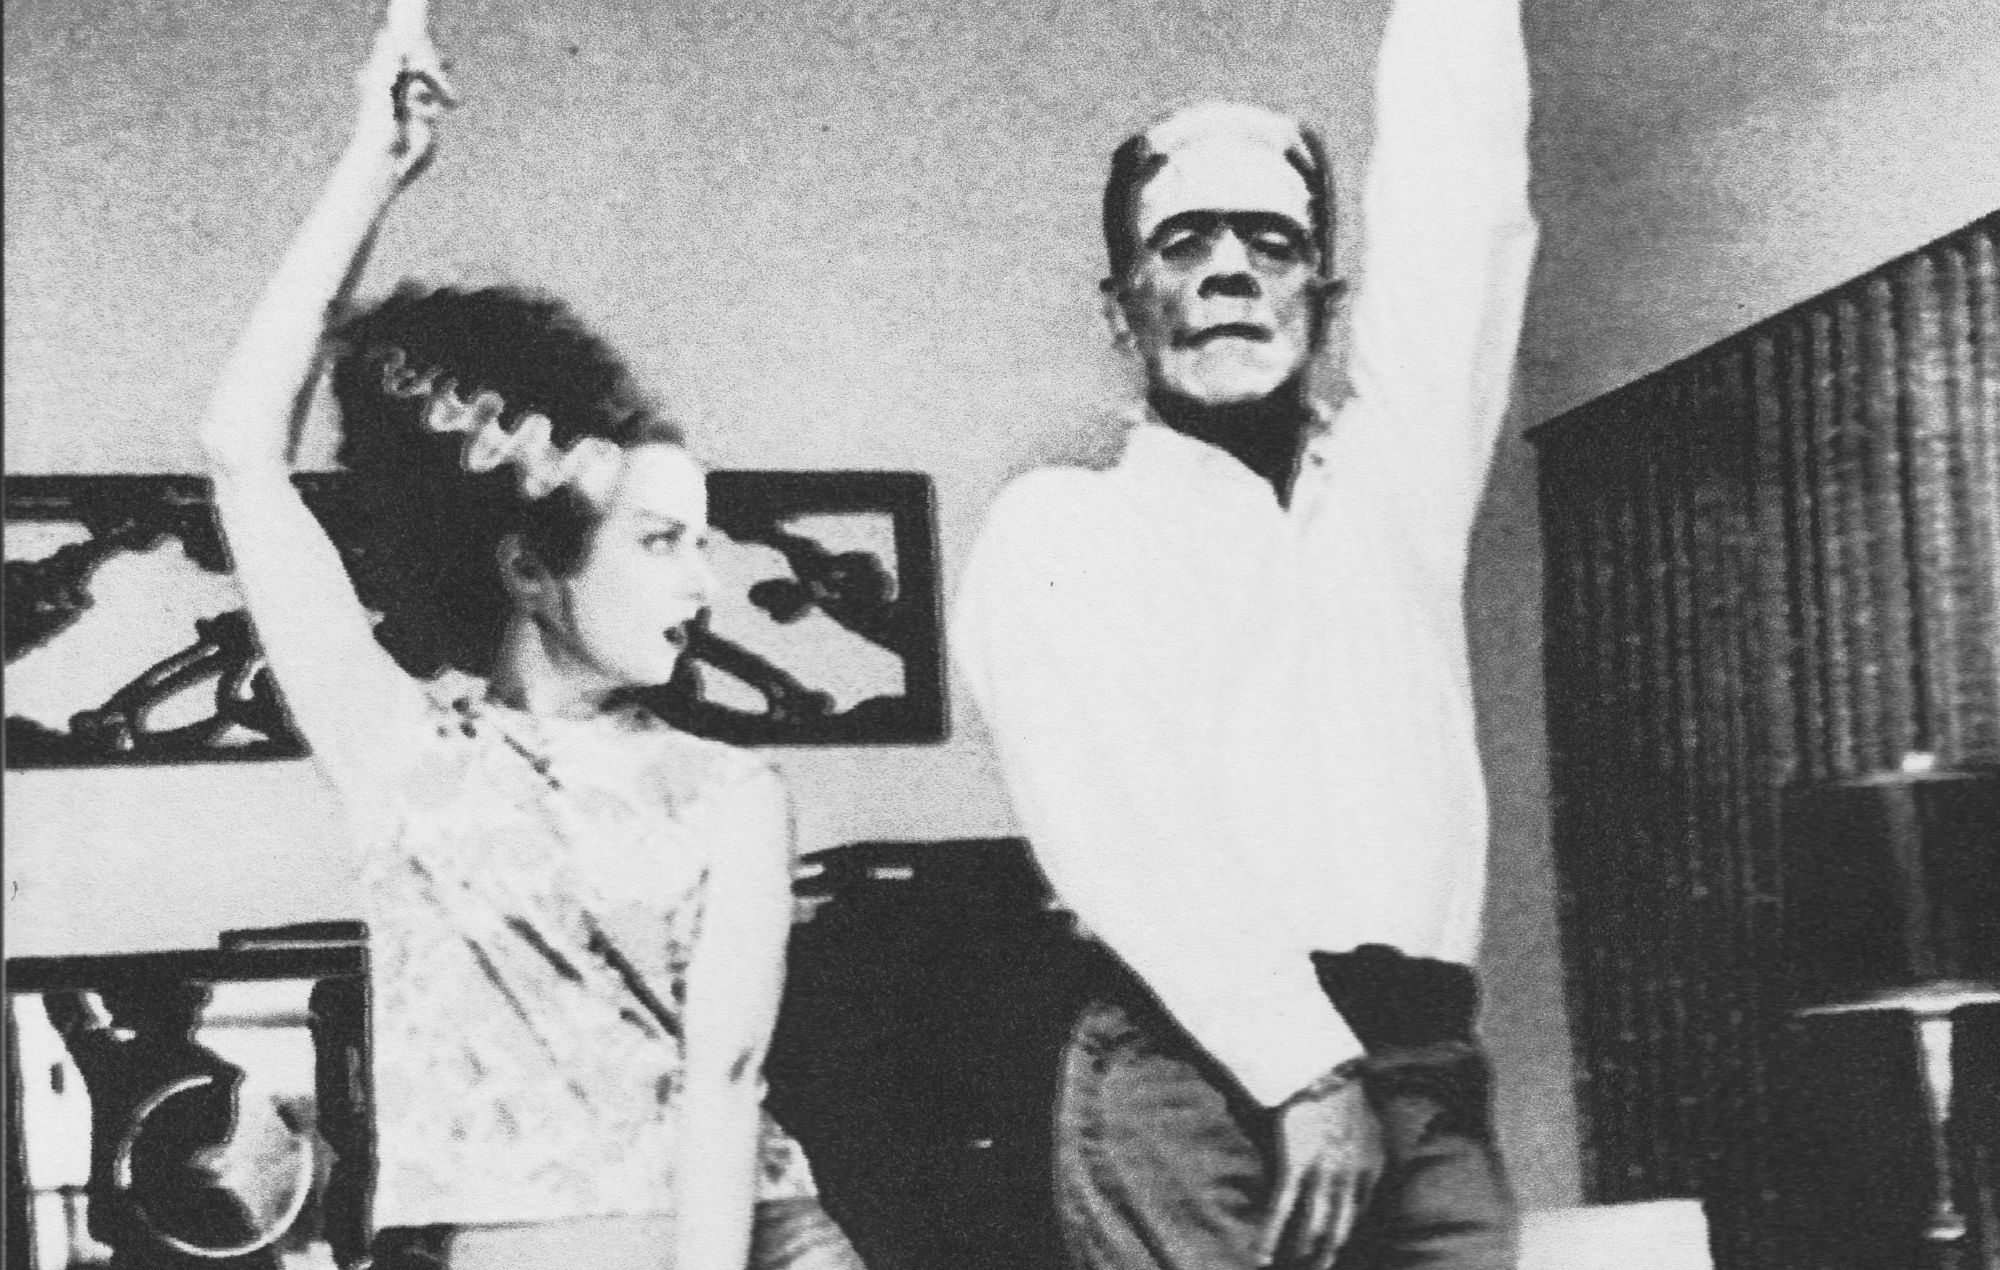 The strange tale of 'Monster Mash', the graveyard smash that will never die